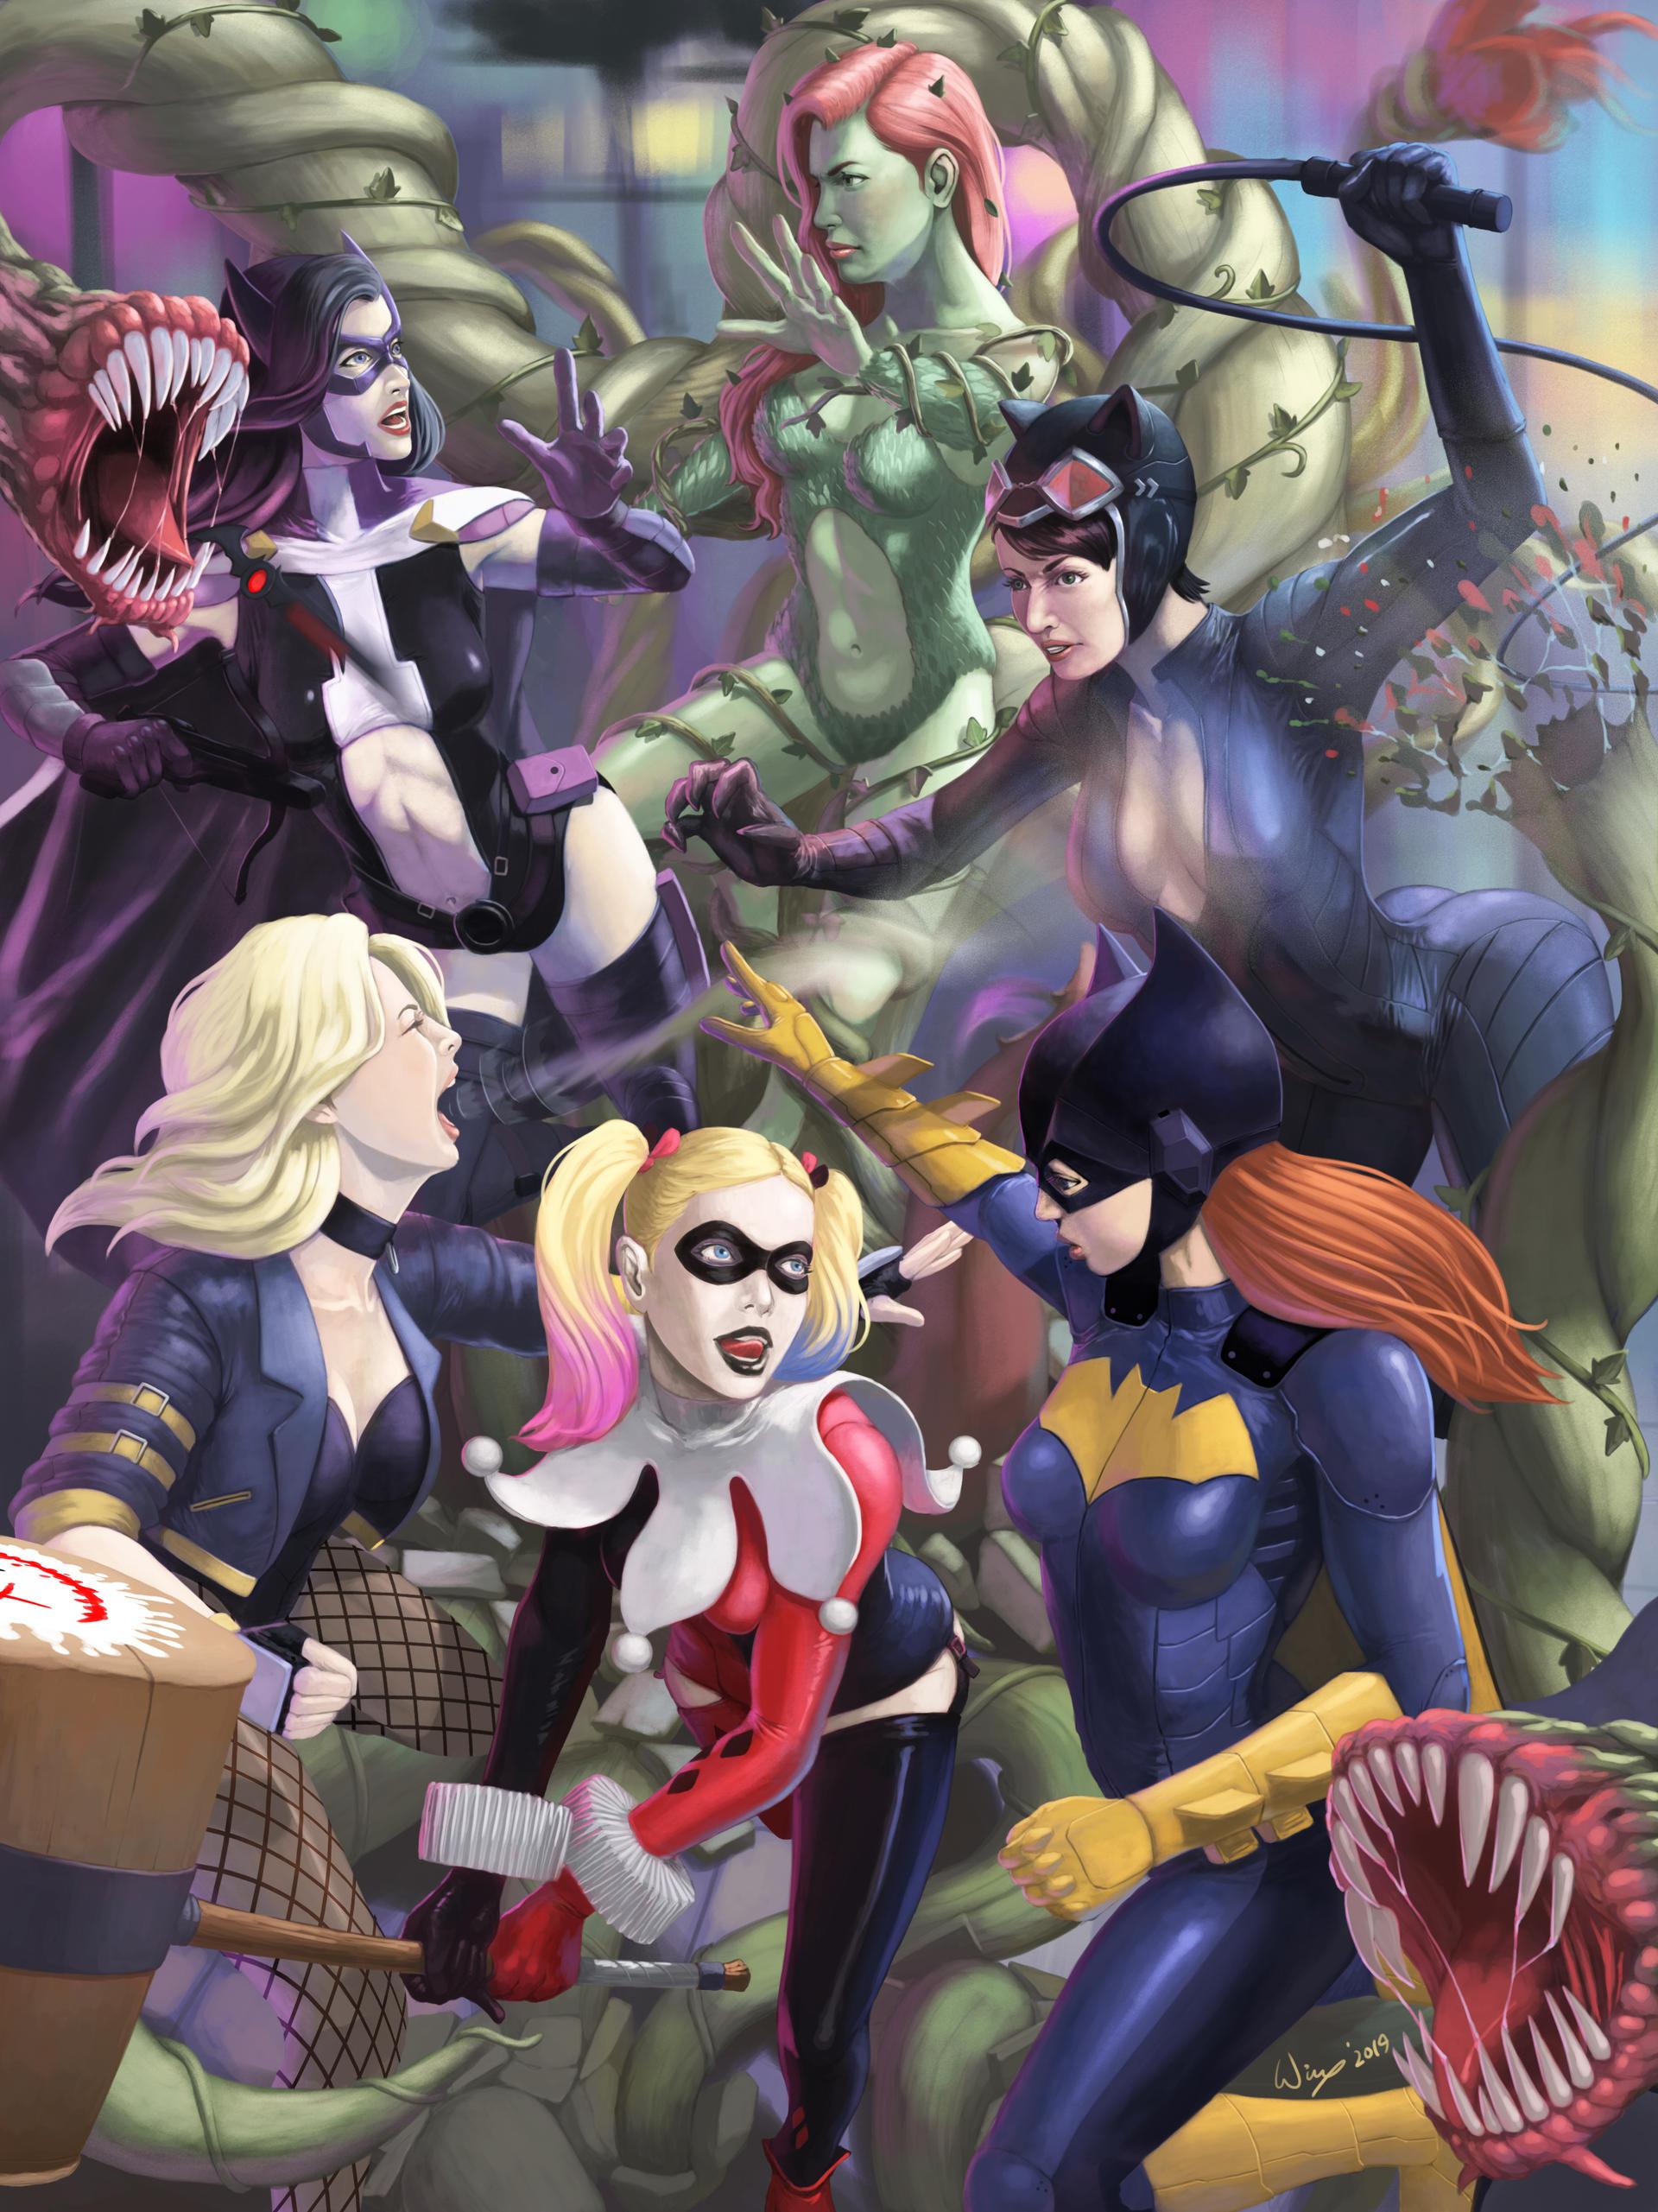 Gotham City Sirens Vs Birds Of Prey By Wingwingwingwing On Deviantart